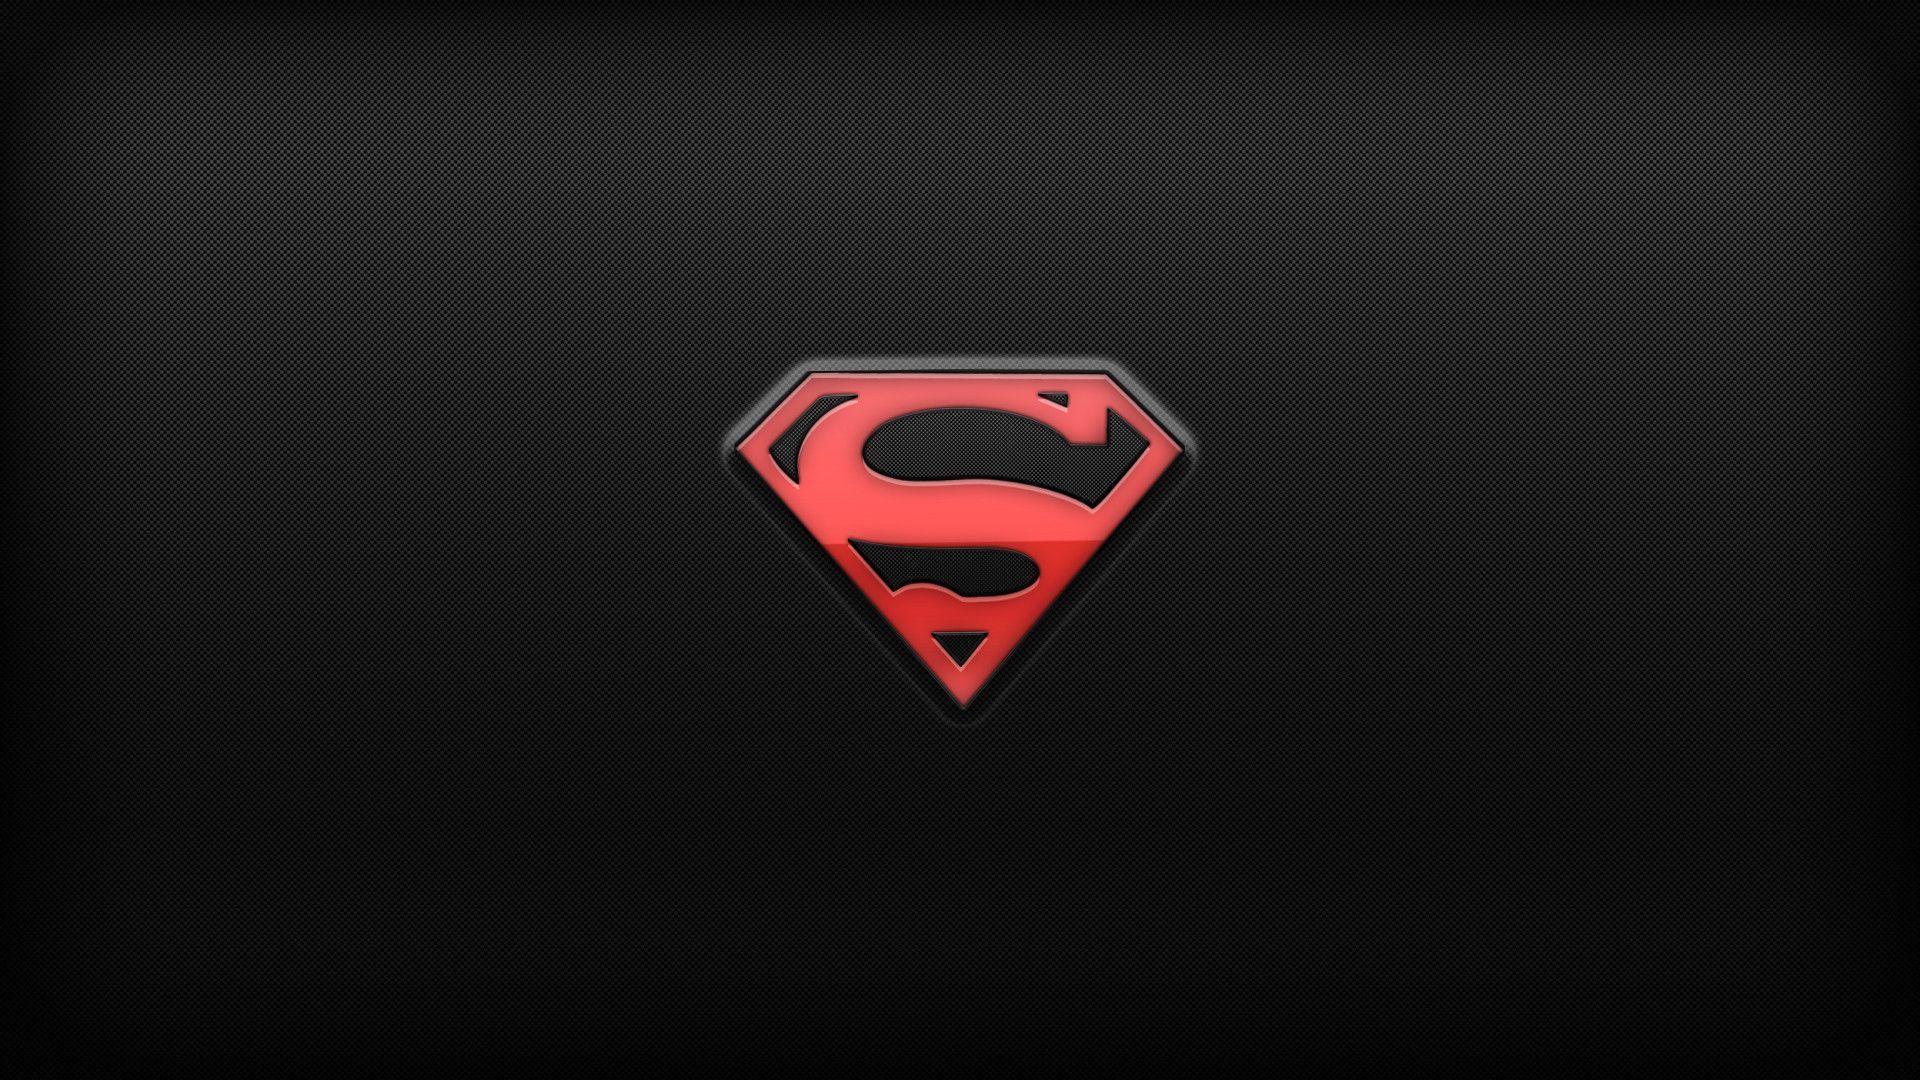 Hd wallpaper superman - Superman Logo Wallpaper Hd 1920x1080 39599 Images And